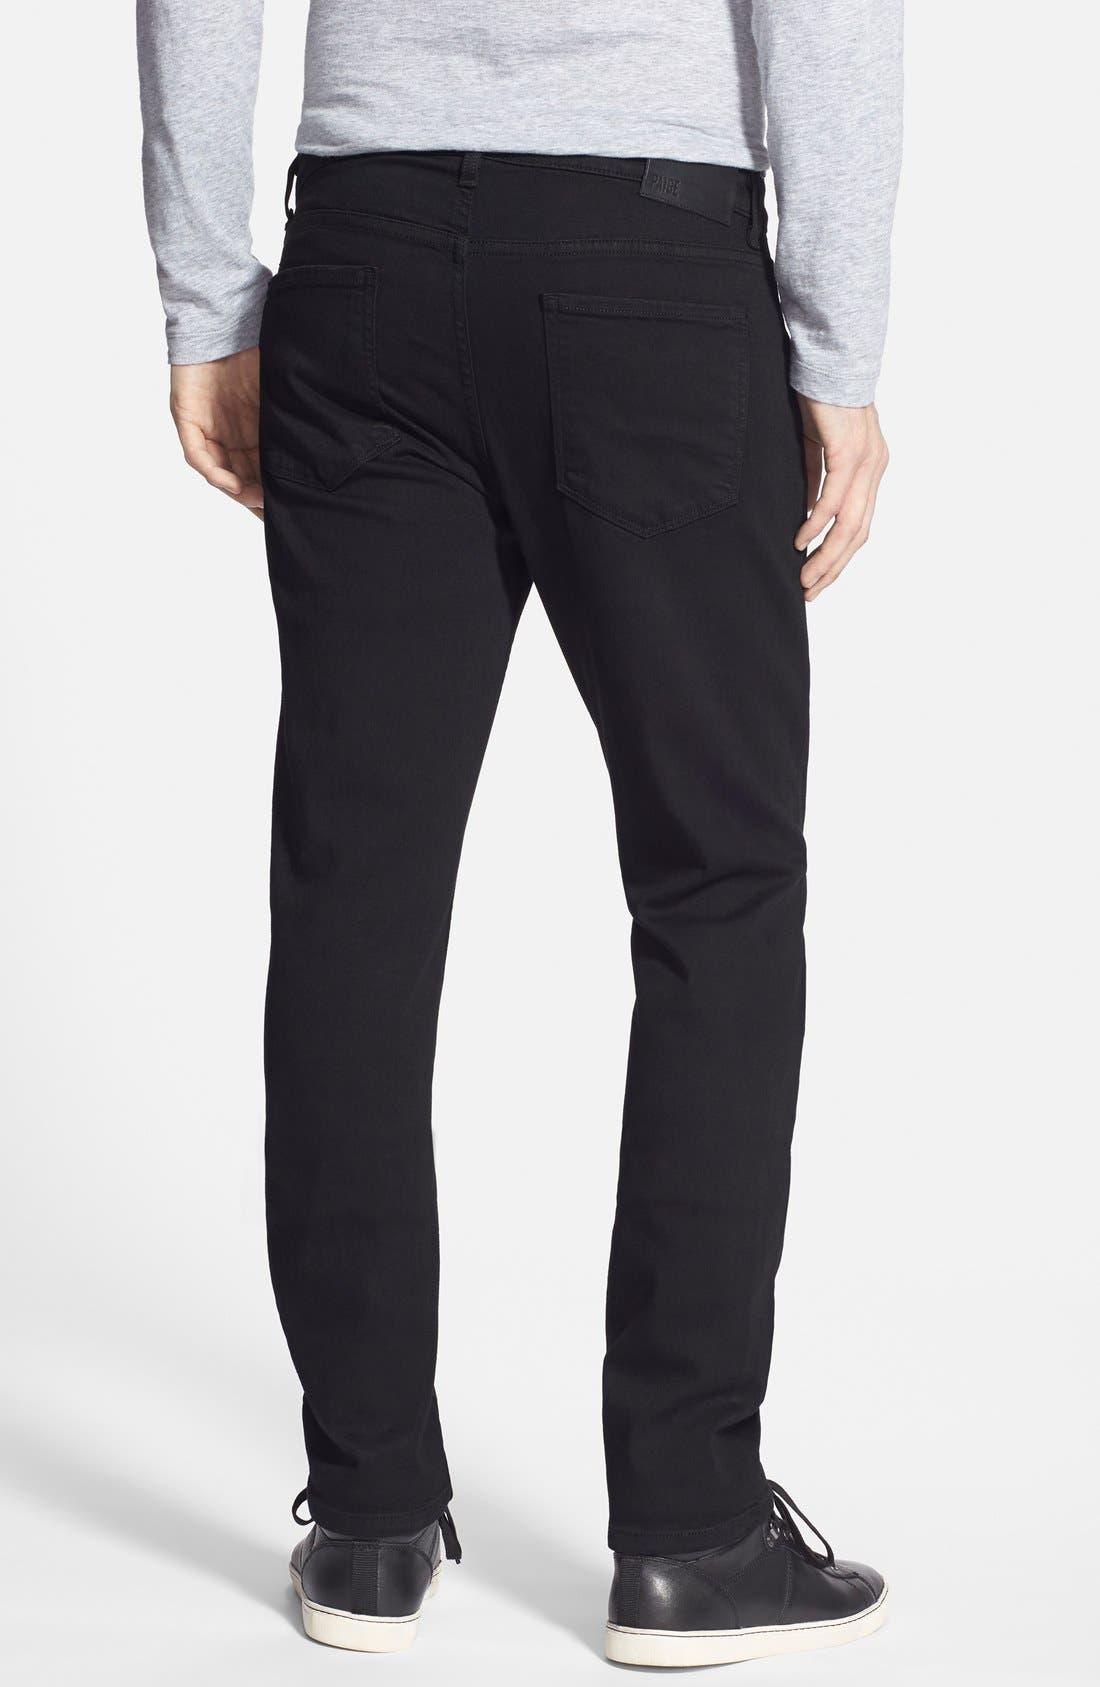 Transcend - Lennox XL Slim Fit Jeans,                             Alternate thumbnail 2, color,                             BLACK